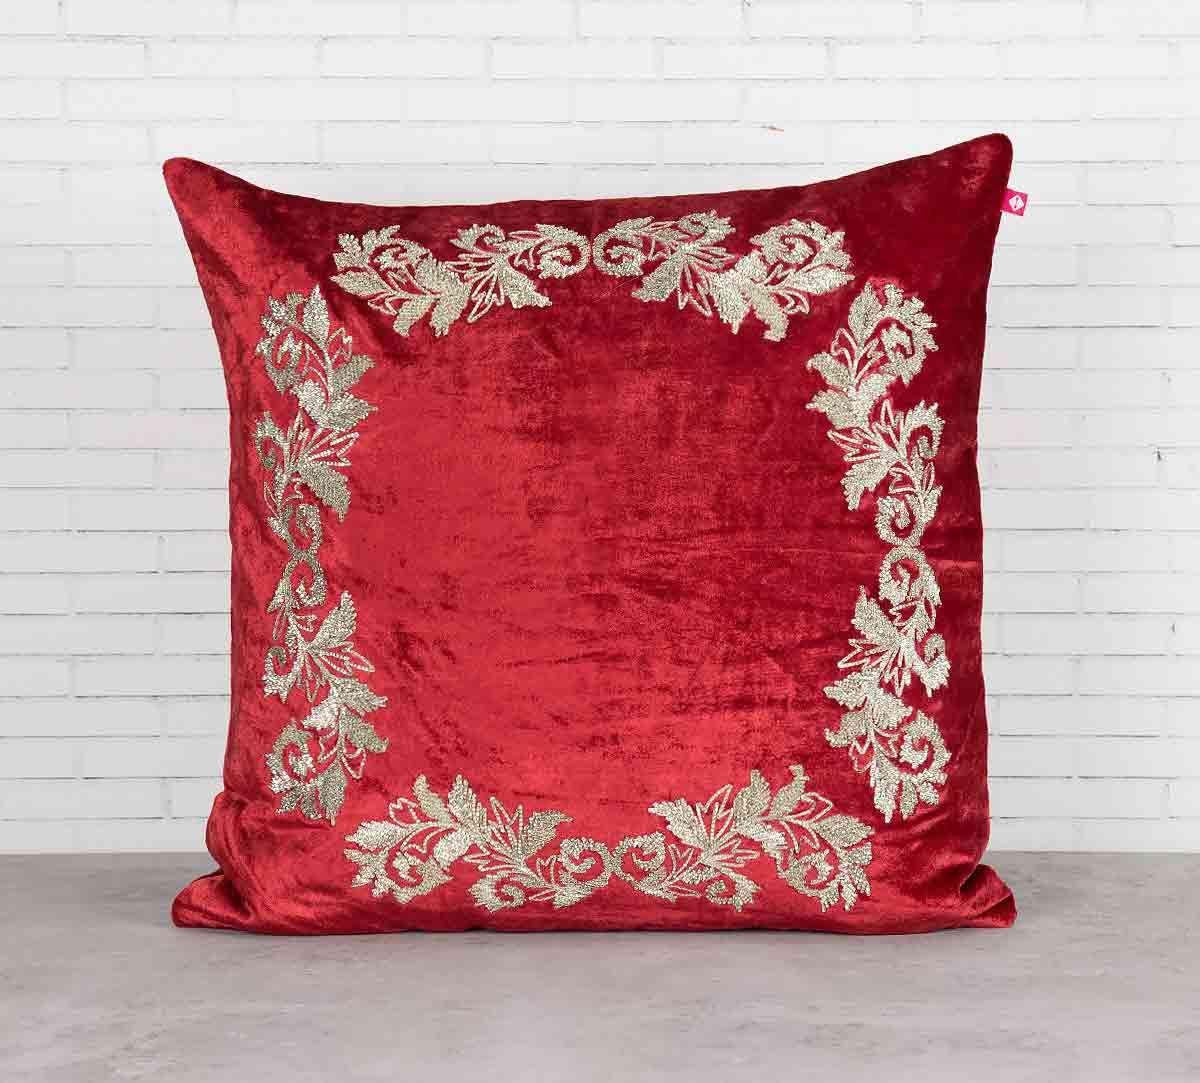 India Circus Floral Enigma Crimson Embroidered Velvet Cushion Cover